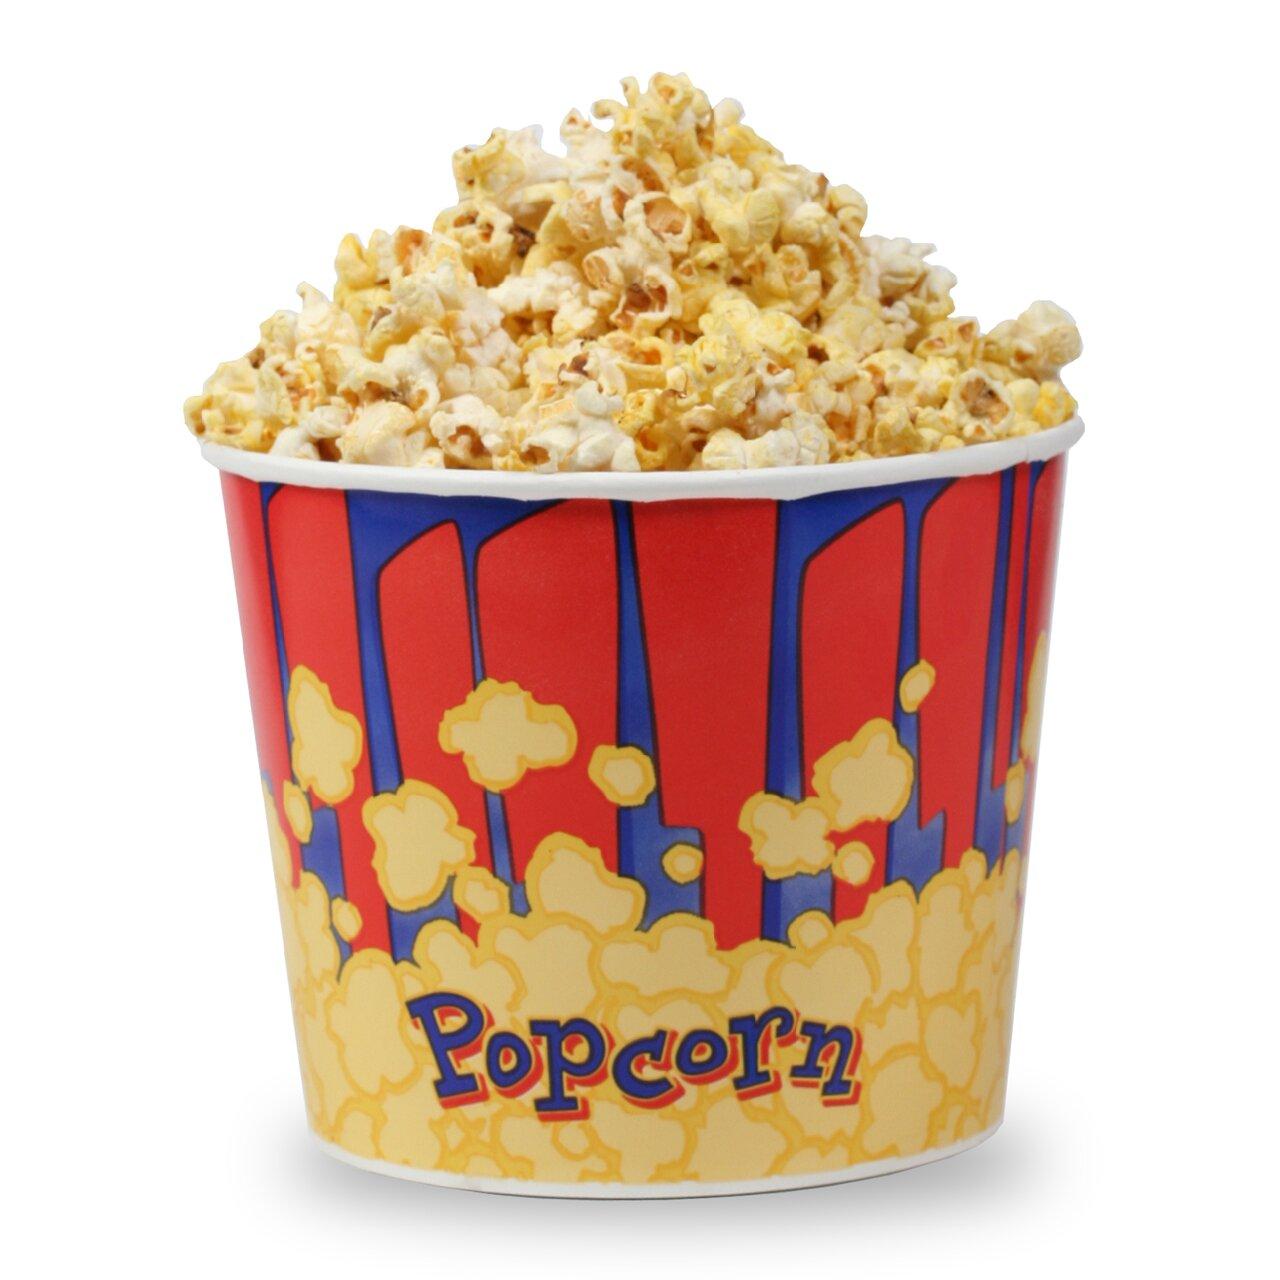 Popcorn bucket.jpg